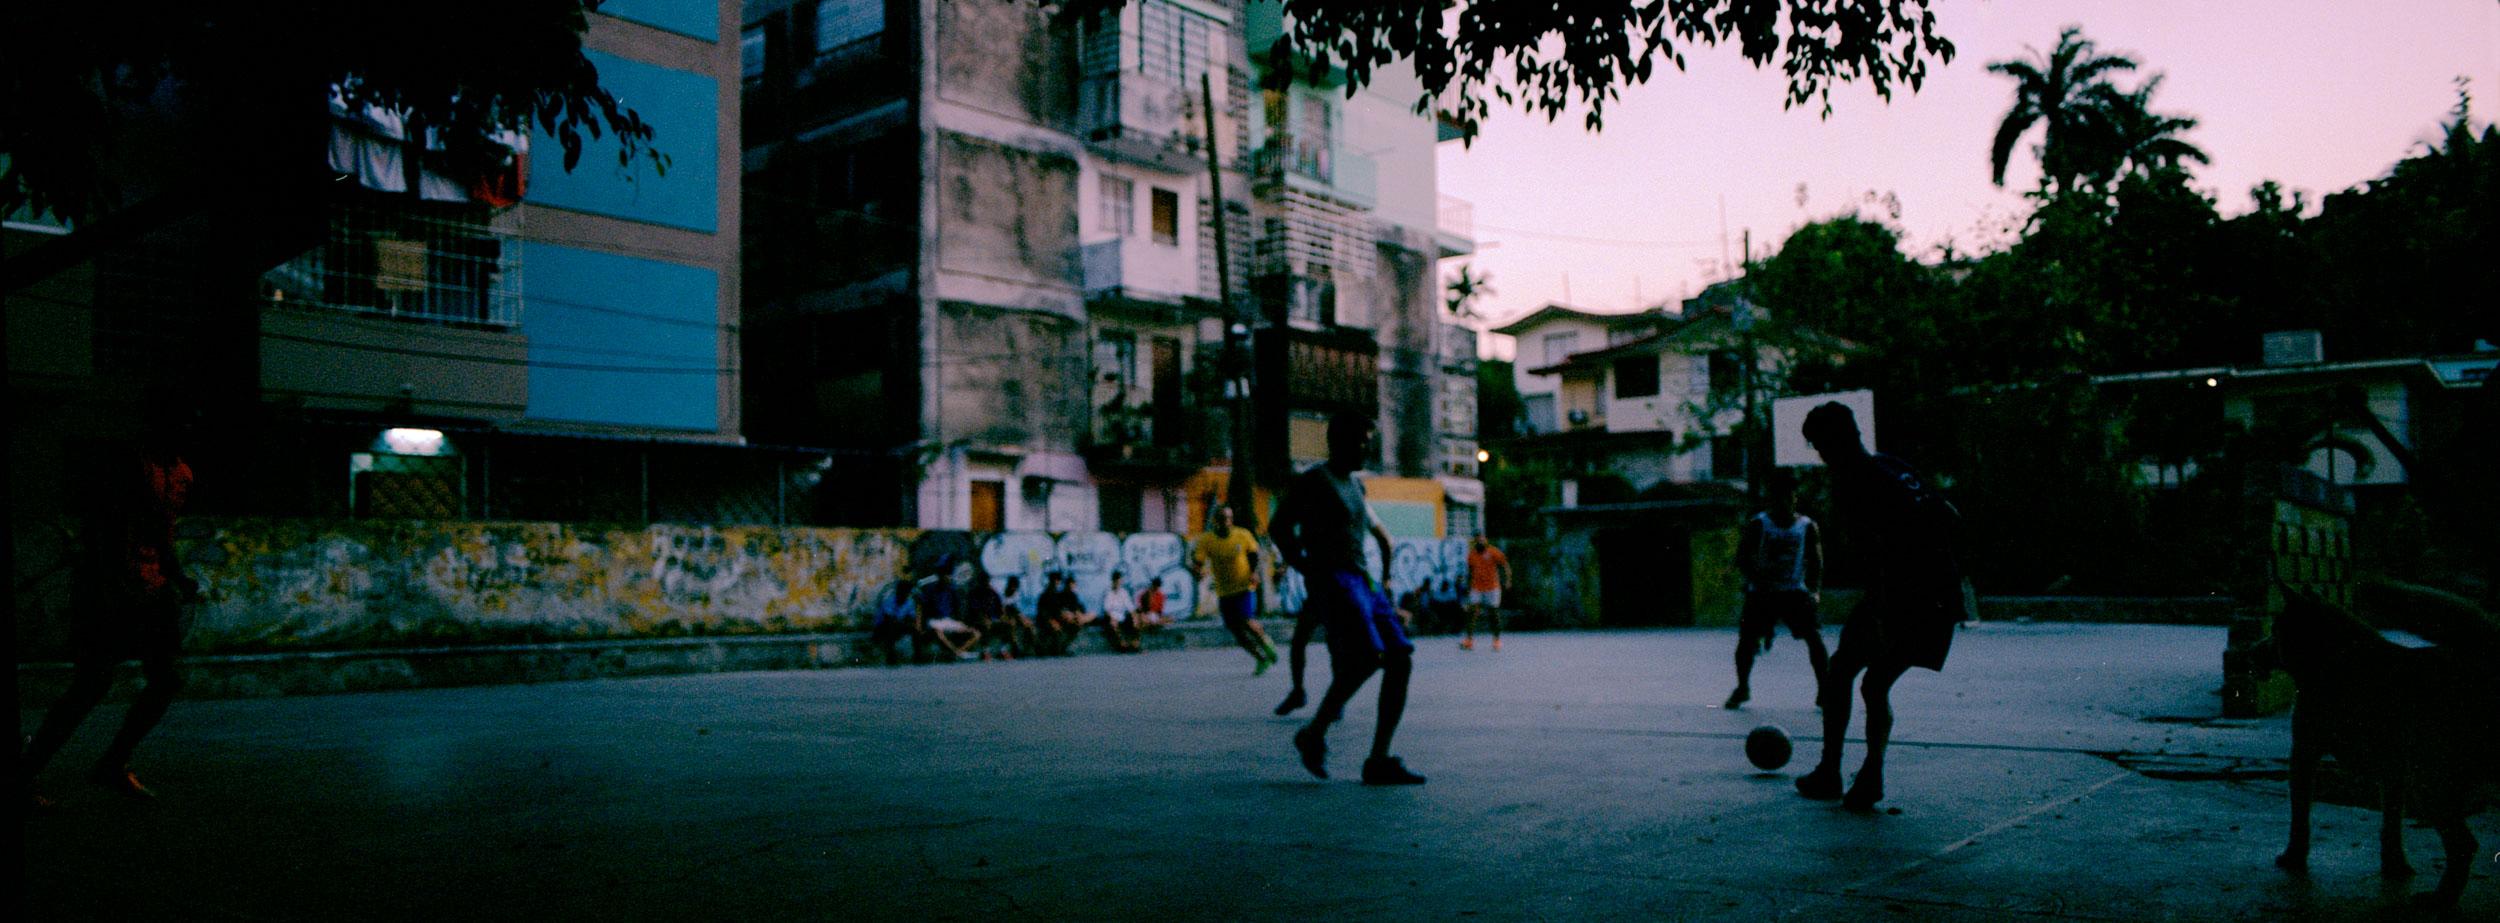 JackMcKain_Havana-106.jpg